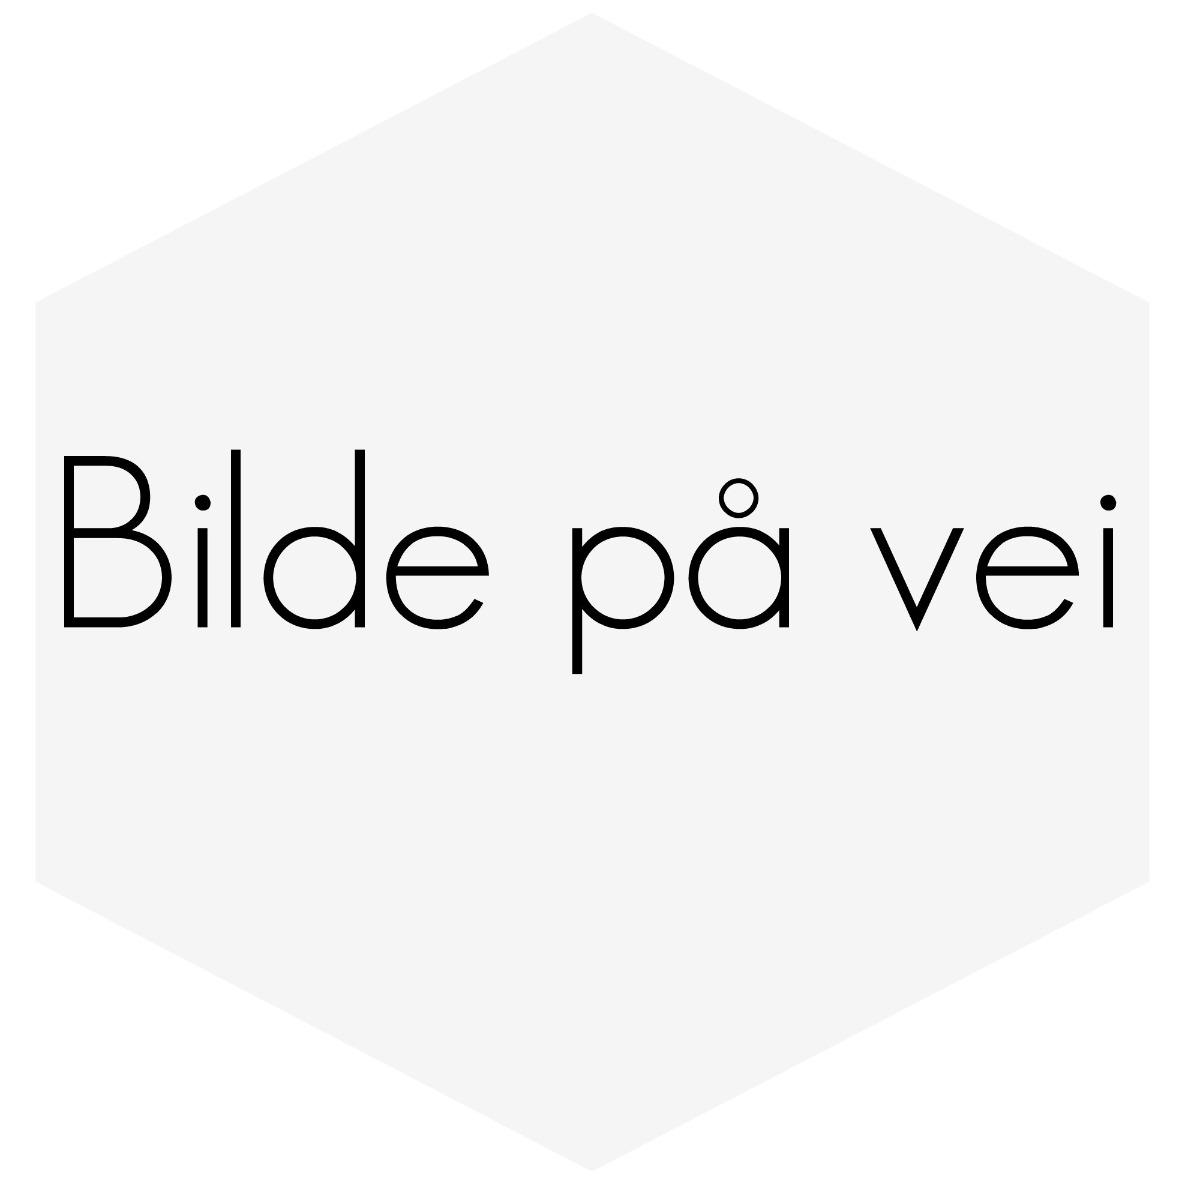 SILIKONSLANGE SVART KOBLINGl 2,125'' (54MM)